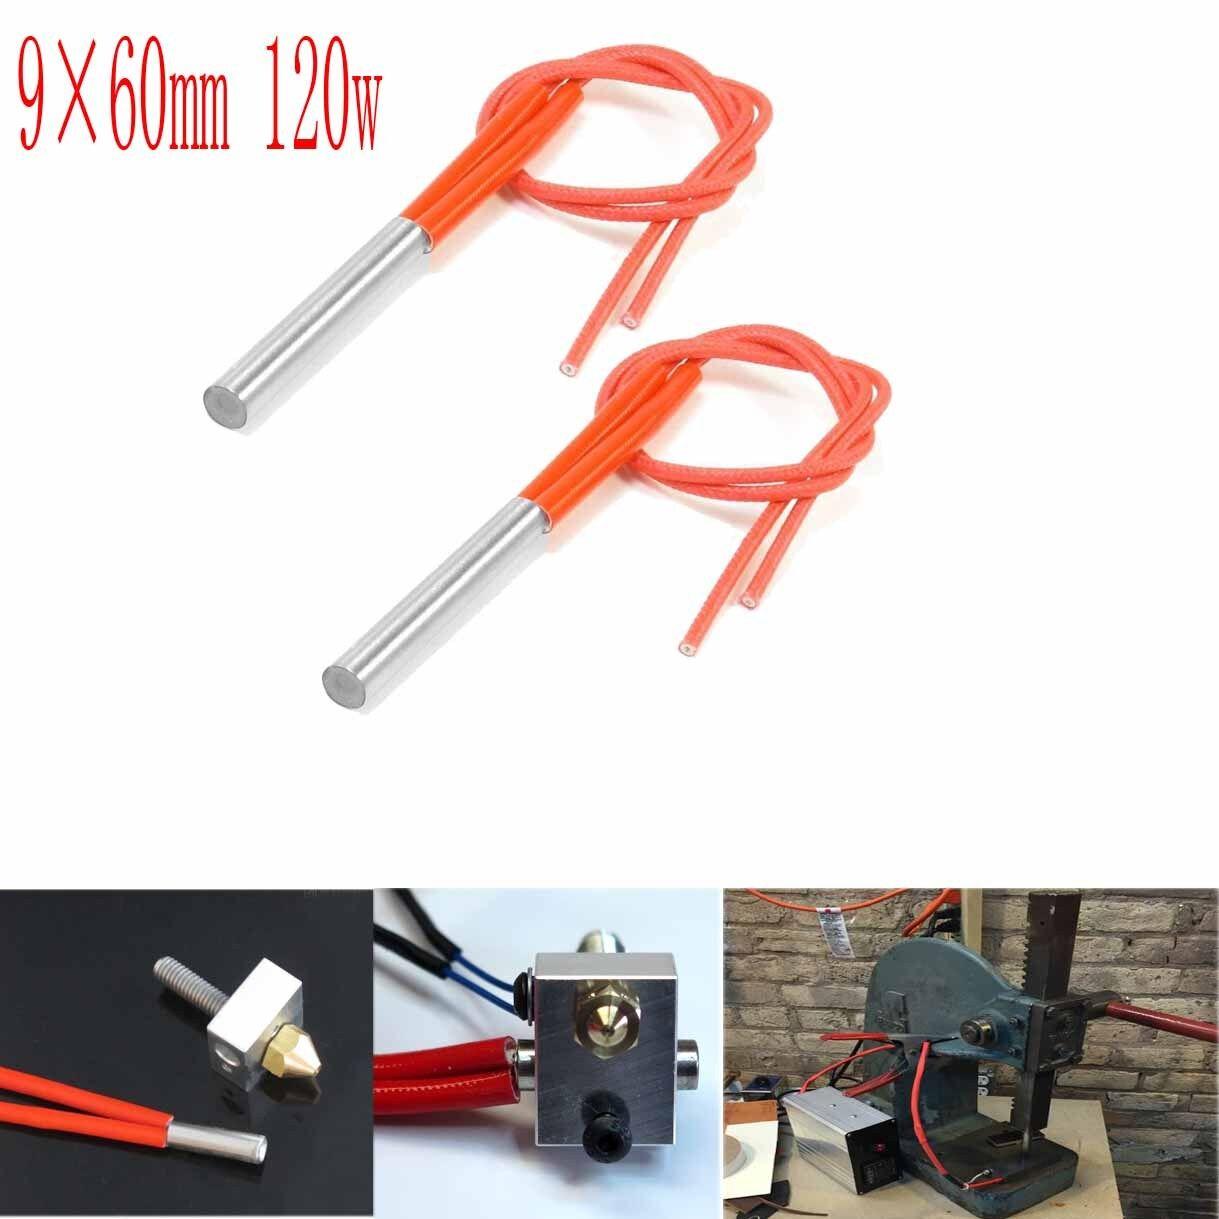 1PCS AC110V 100W Single End Mould Cartridge Heater Tubing Heating Element 8*40mm